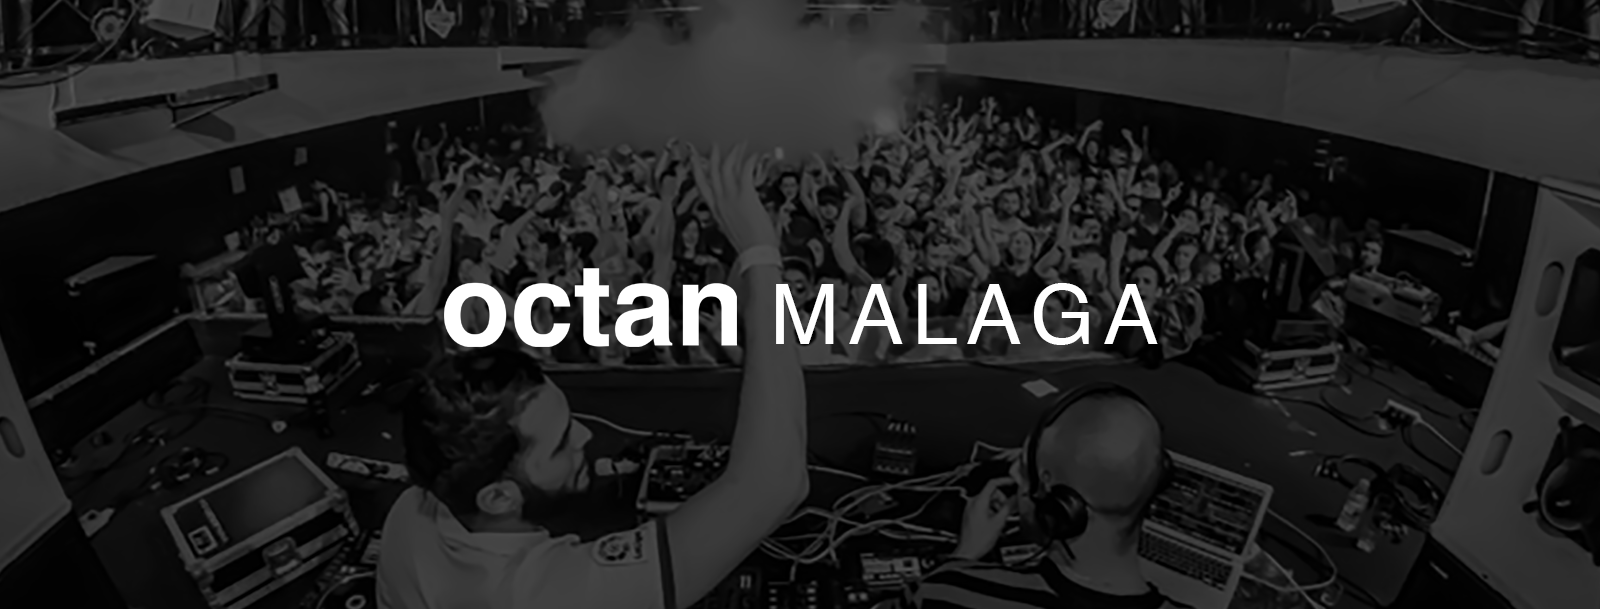 Octan Malaga Nightclub in Costa del Sol